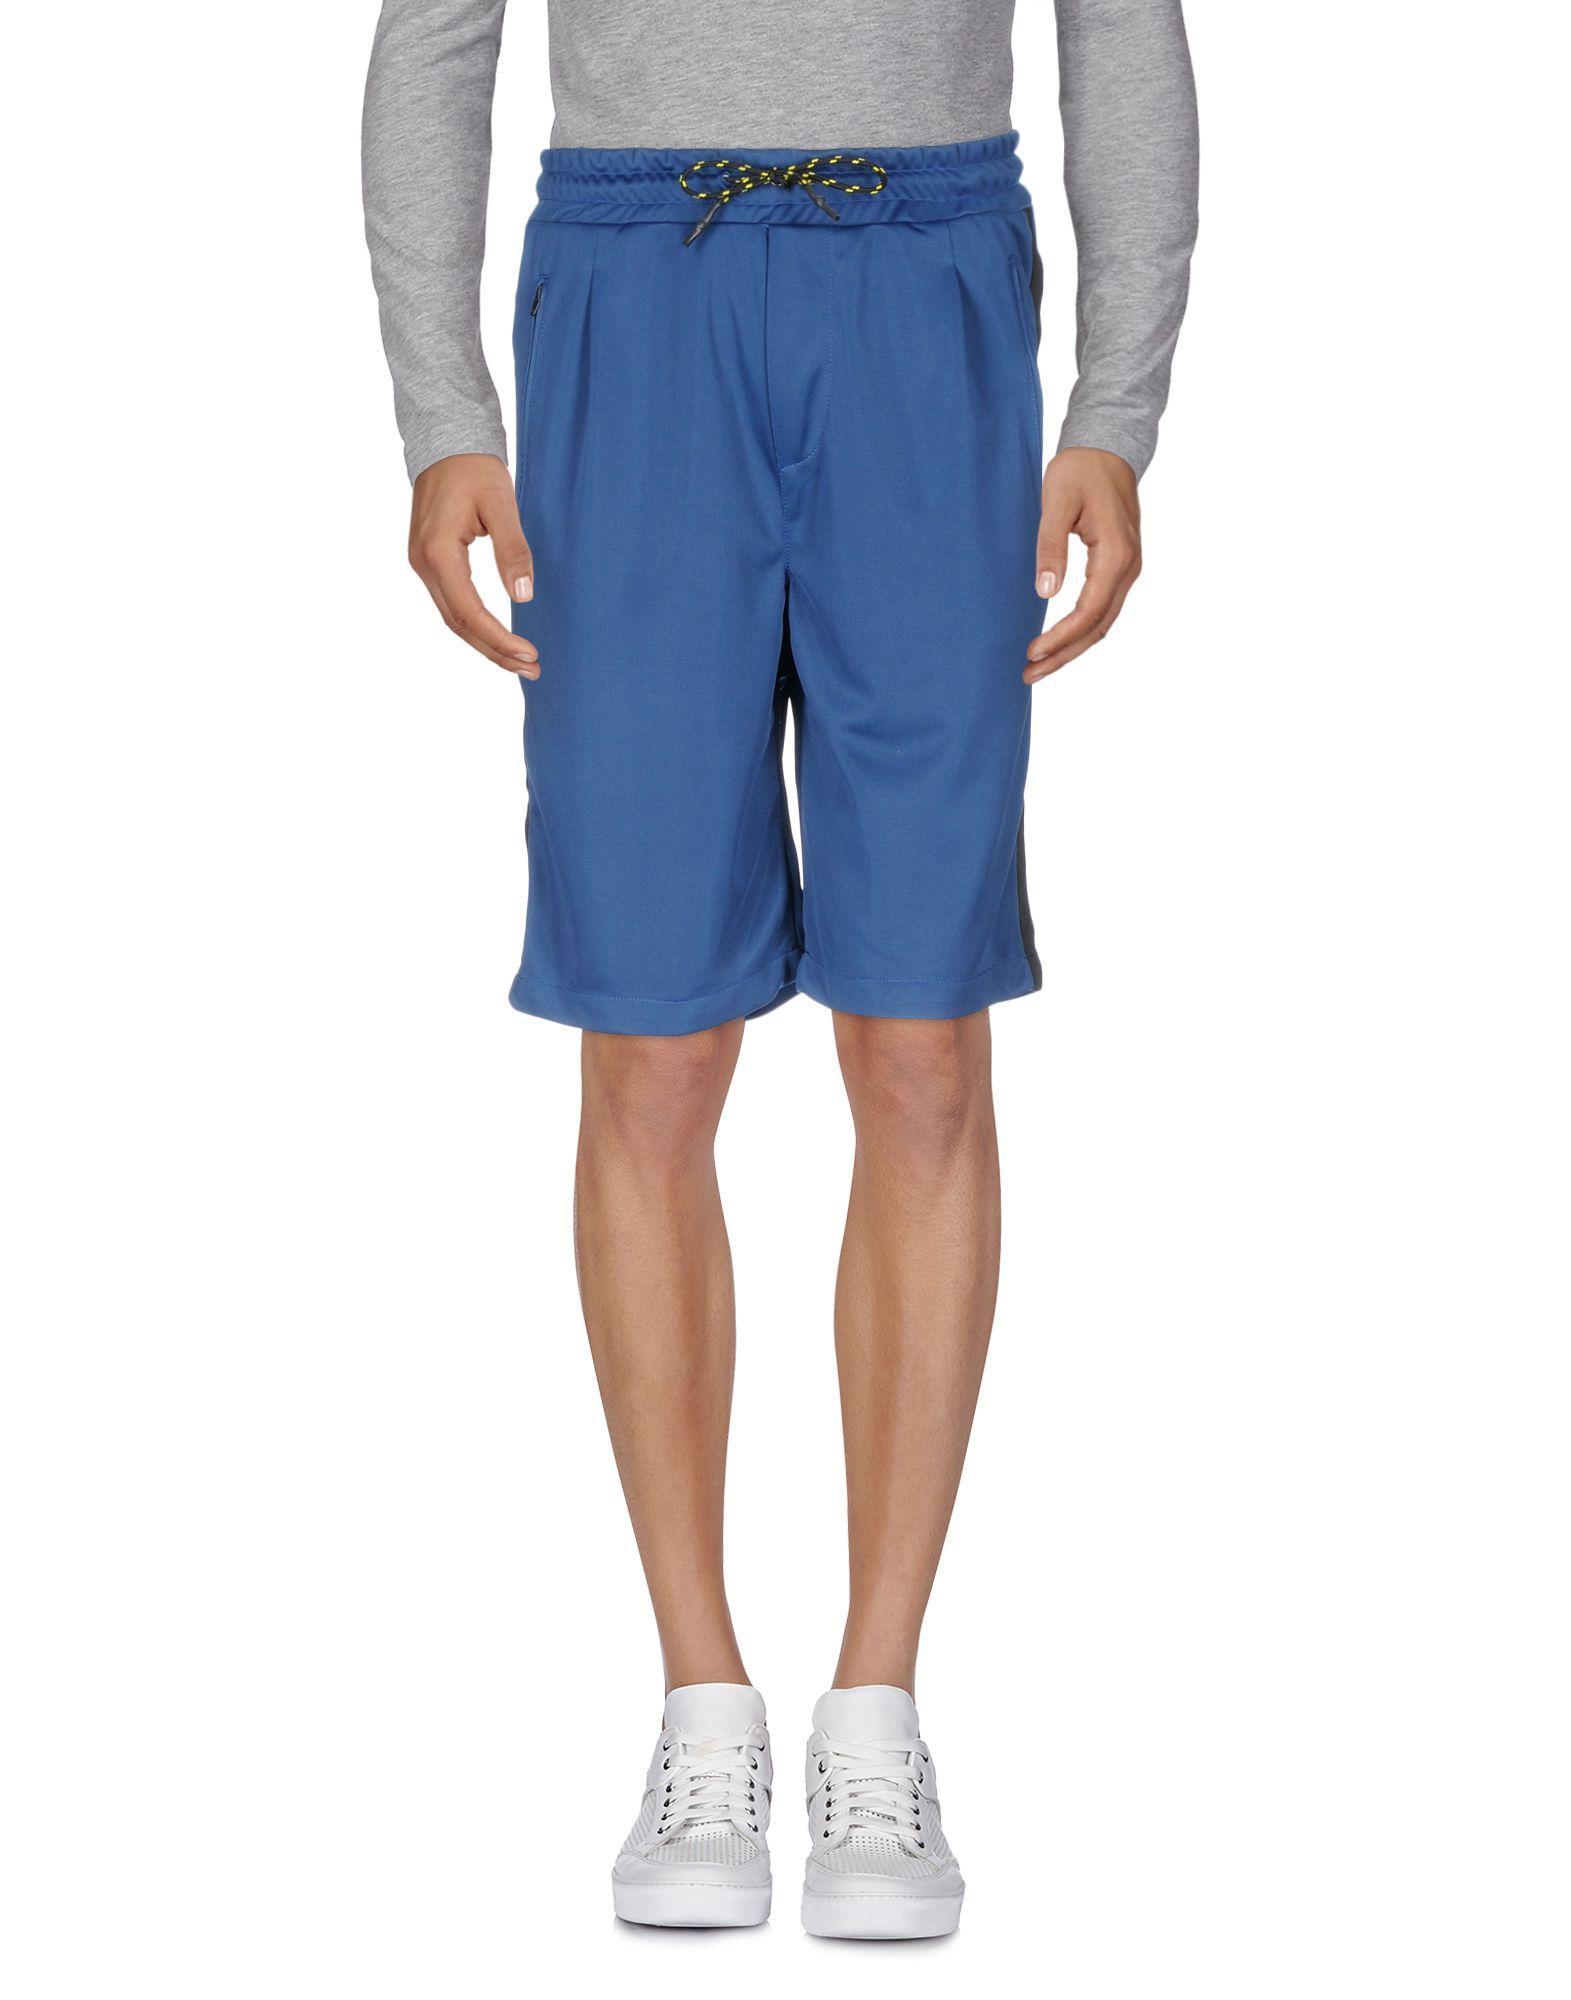 Low Brand Shorts & Bermuda In Blue